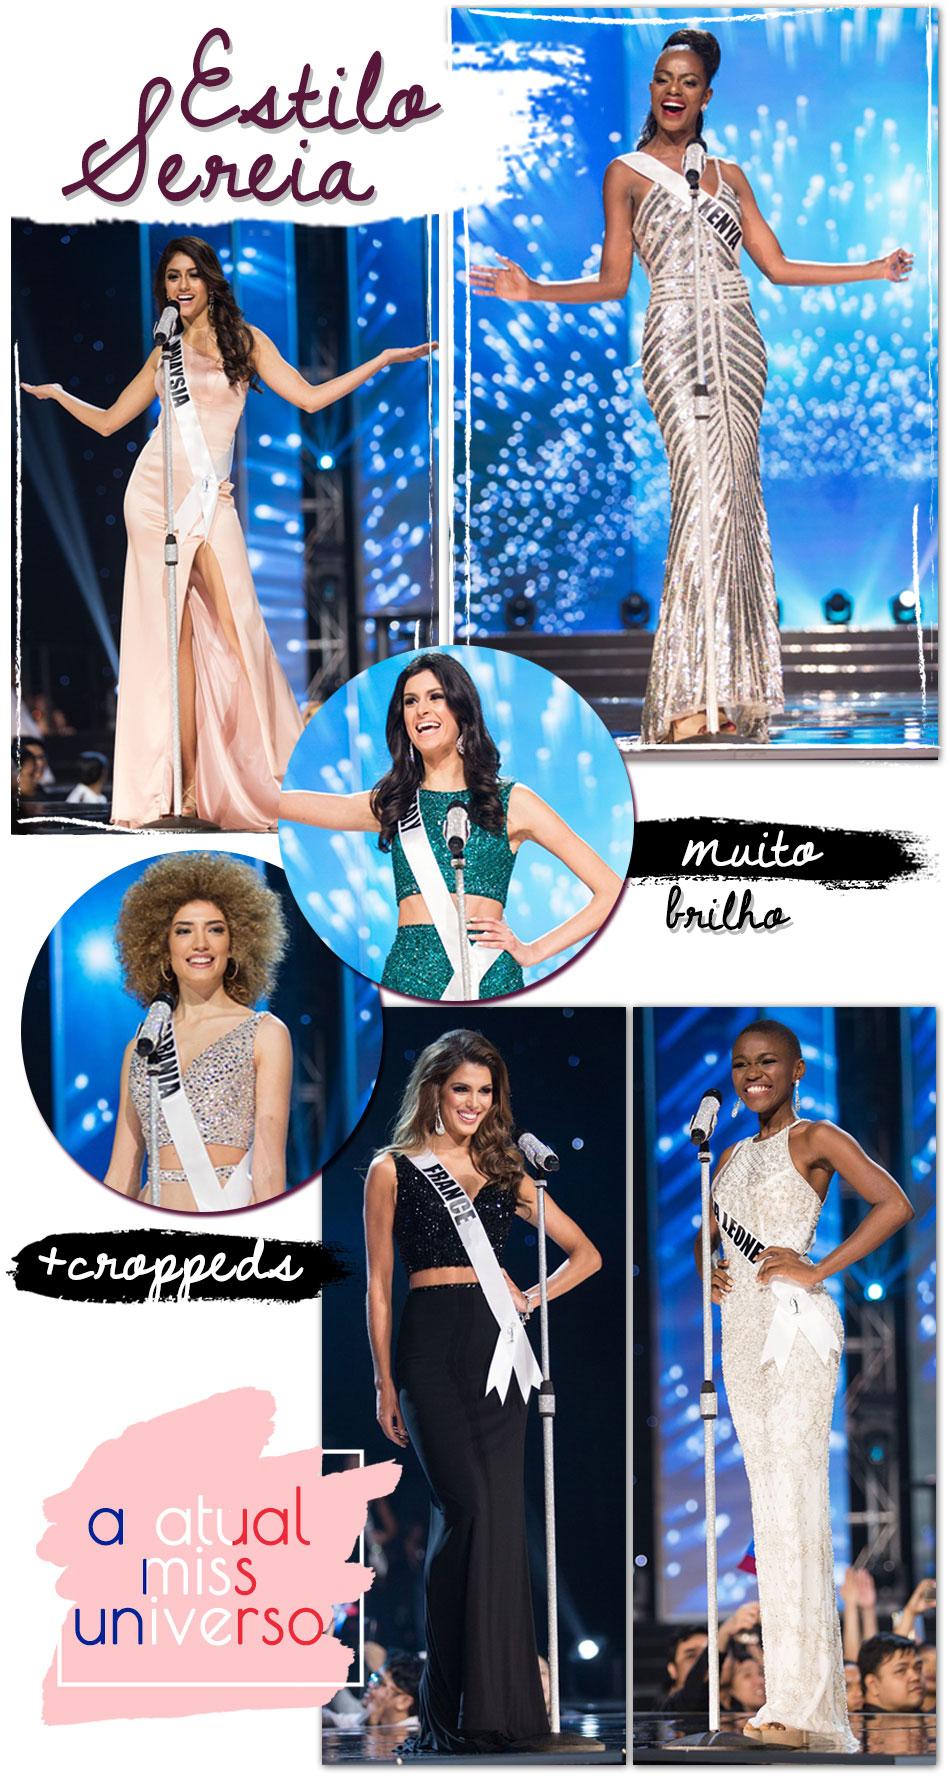 Miss Universo 2017